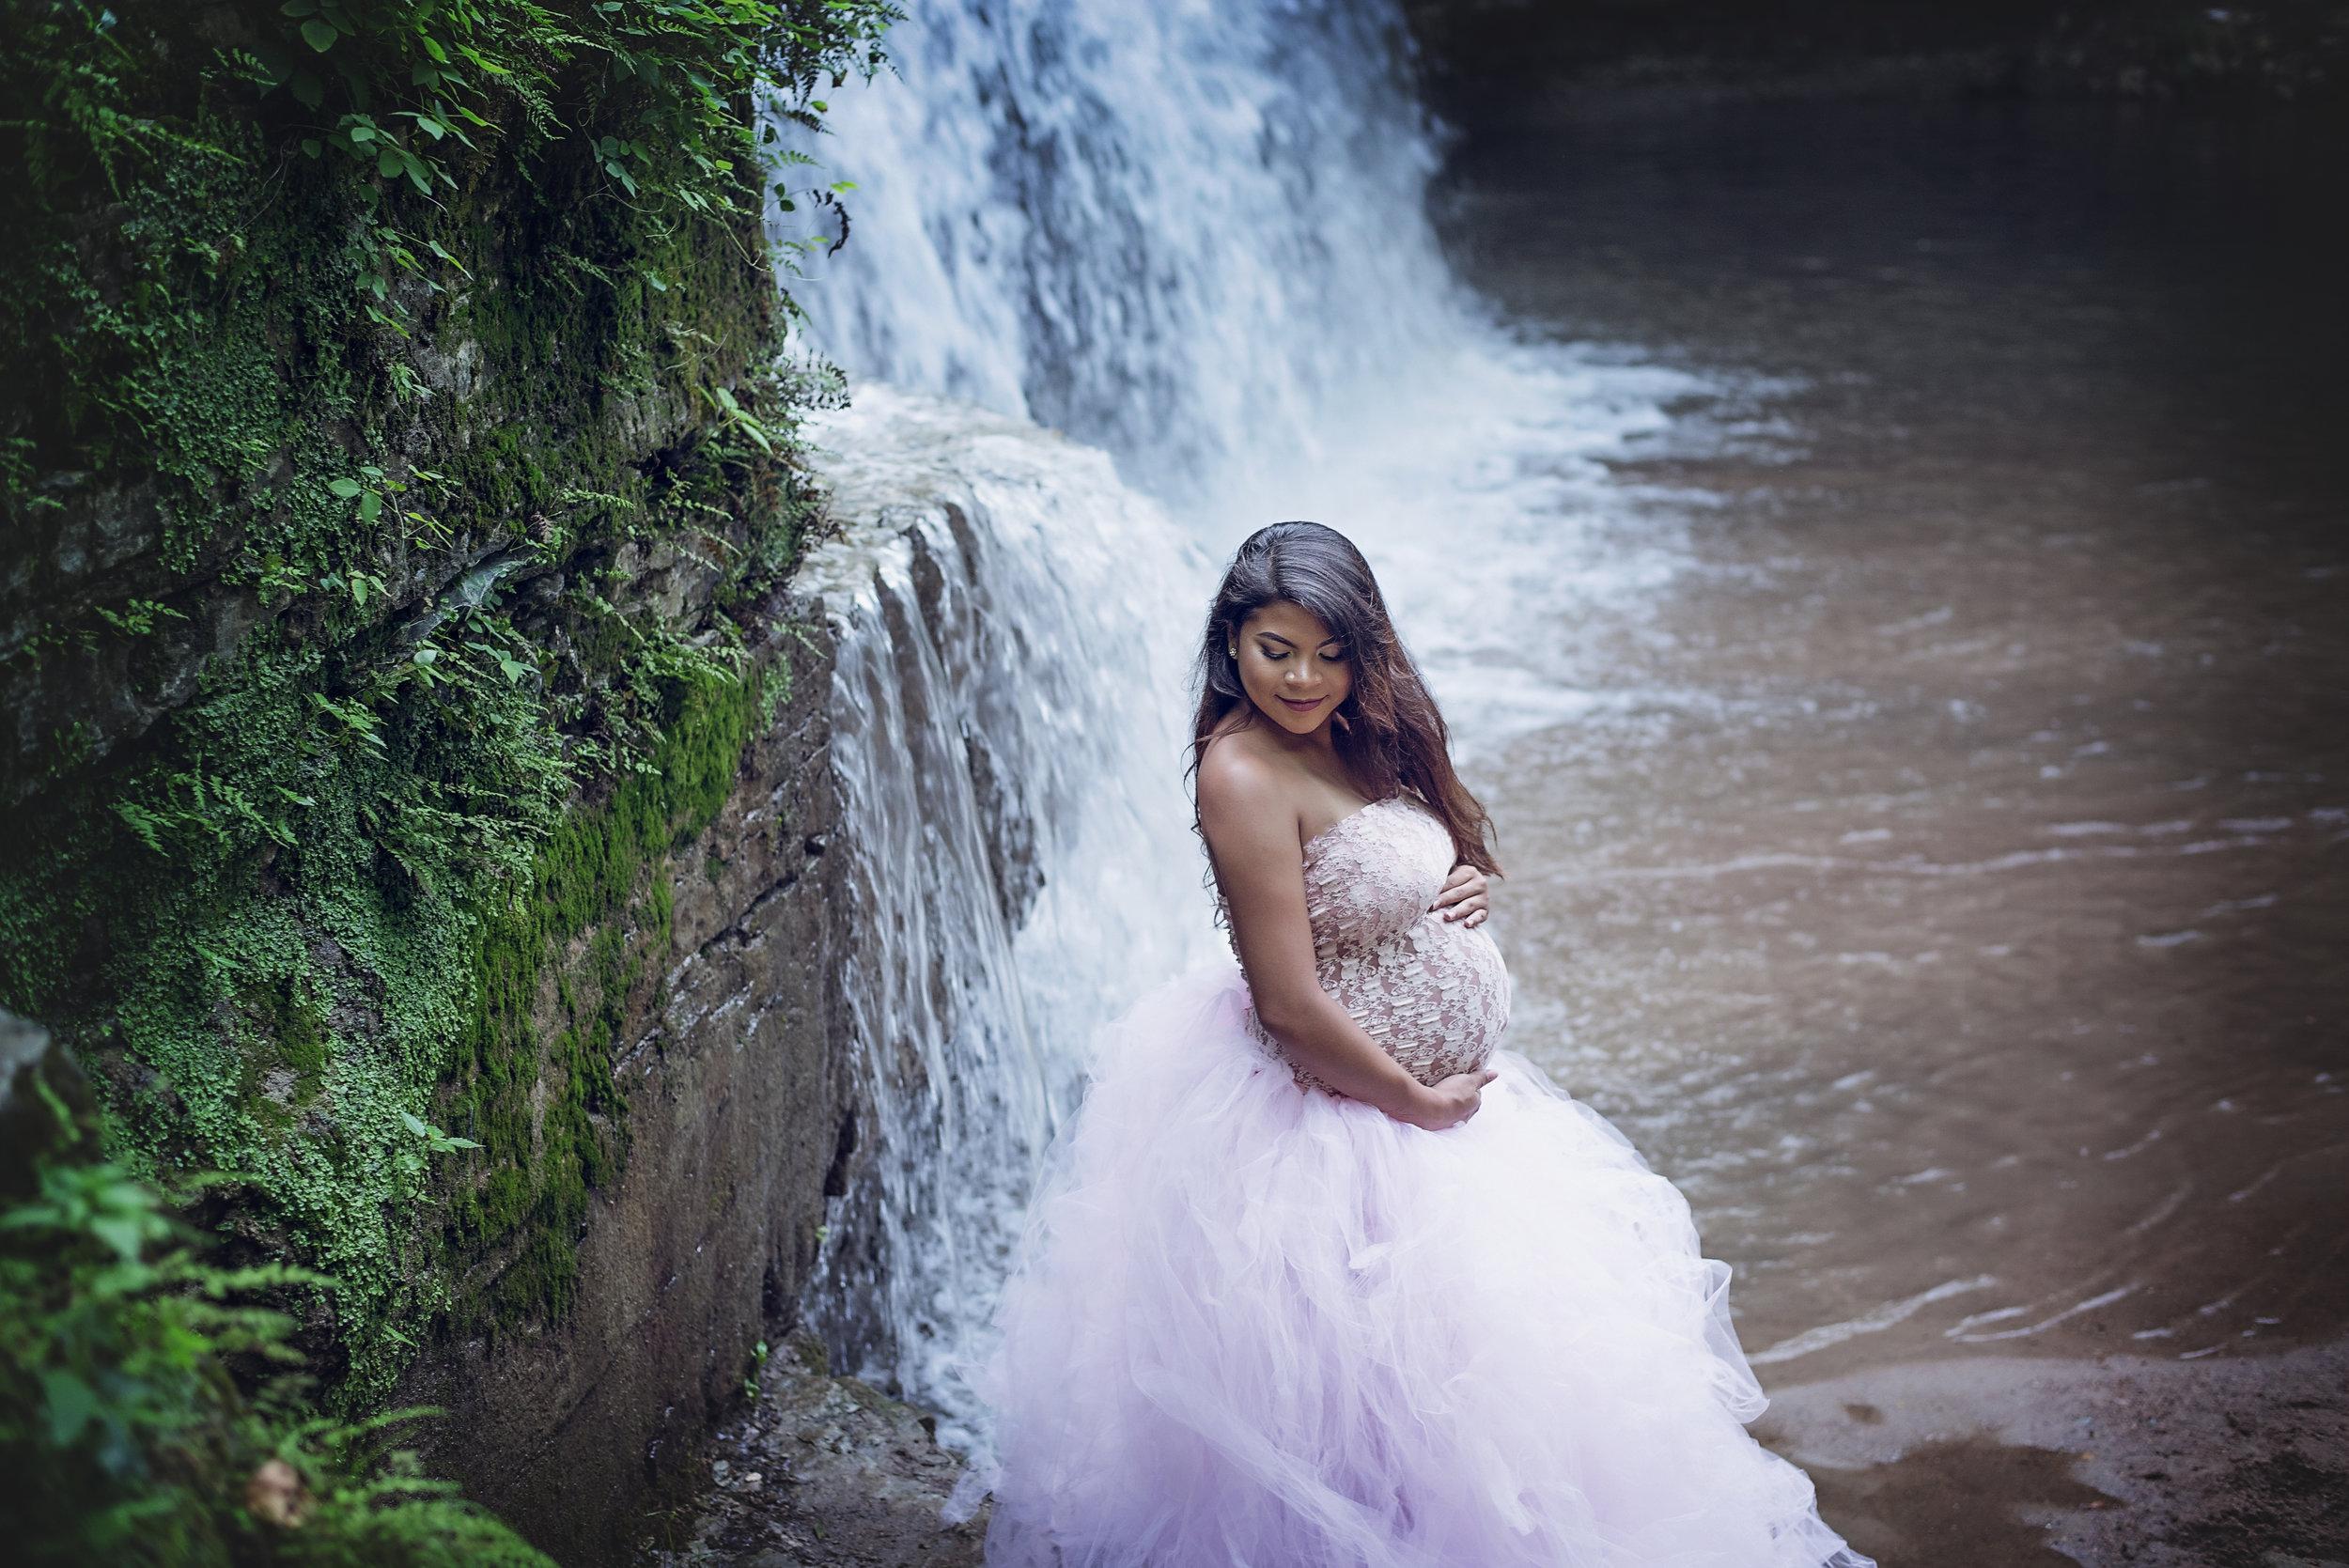 MN_Maternity_Photographer